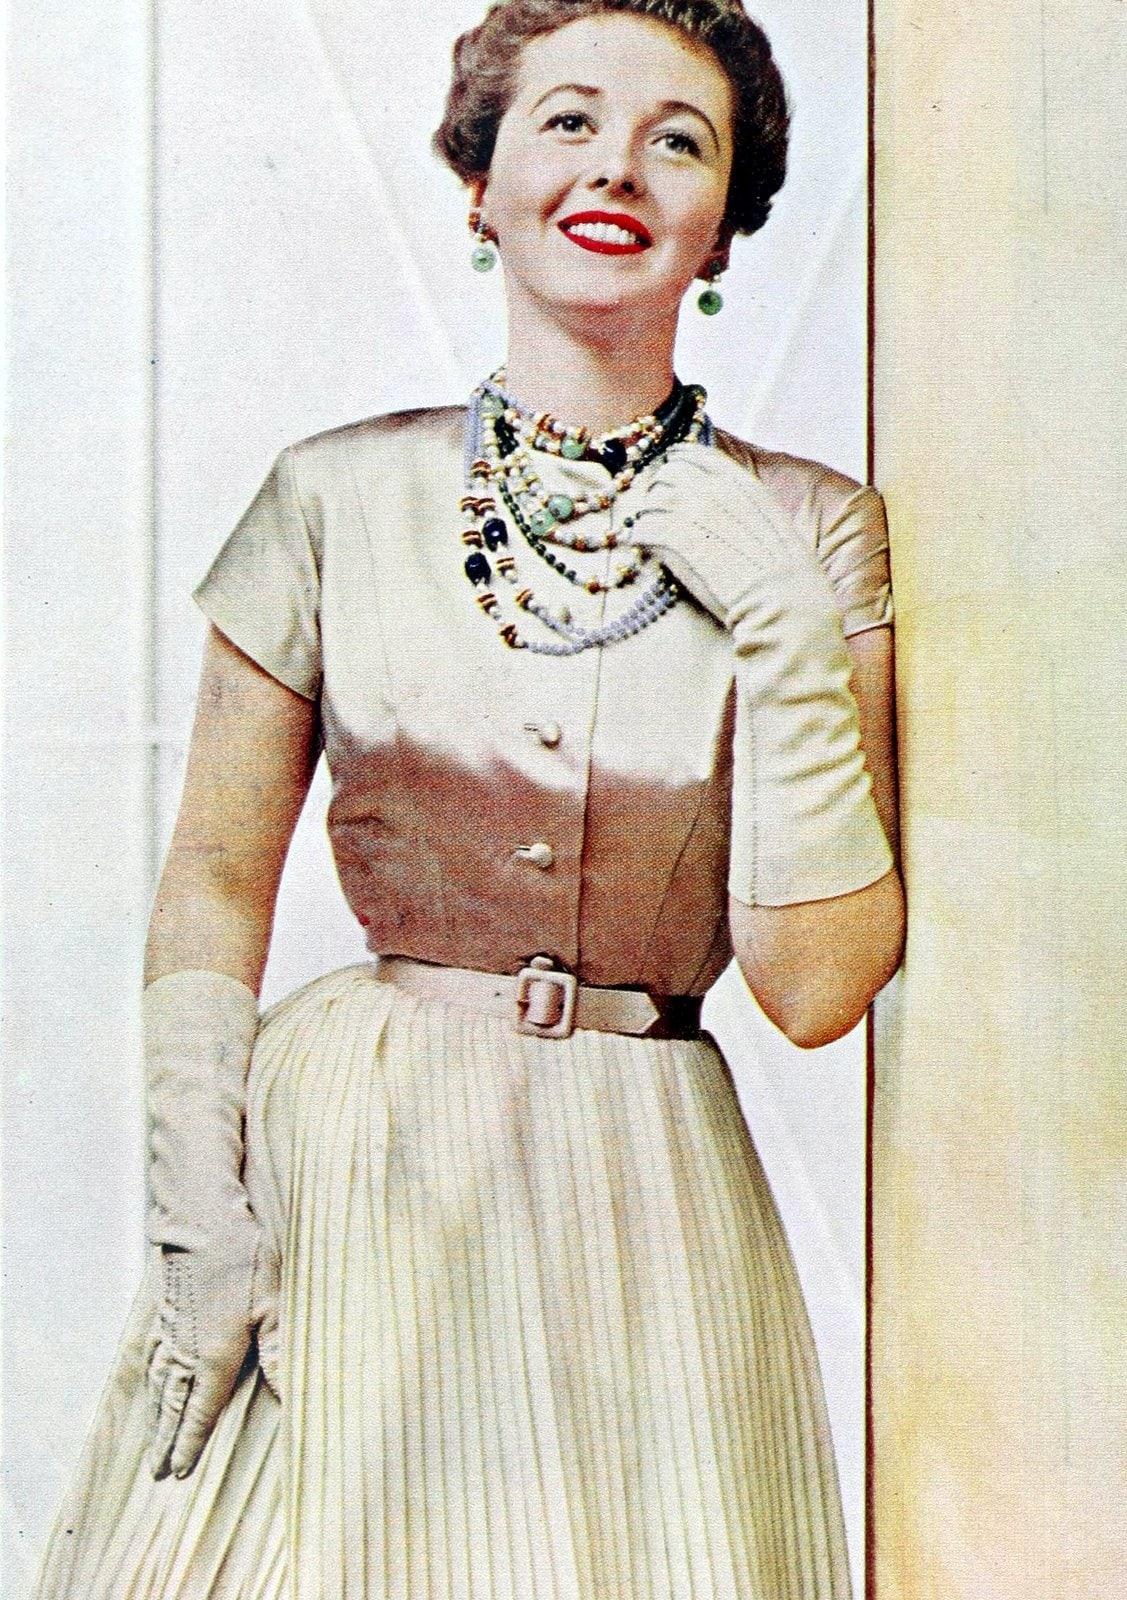 Vintage 50s women wearing gloves (9)